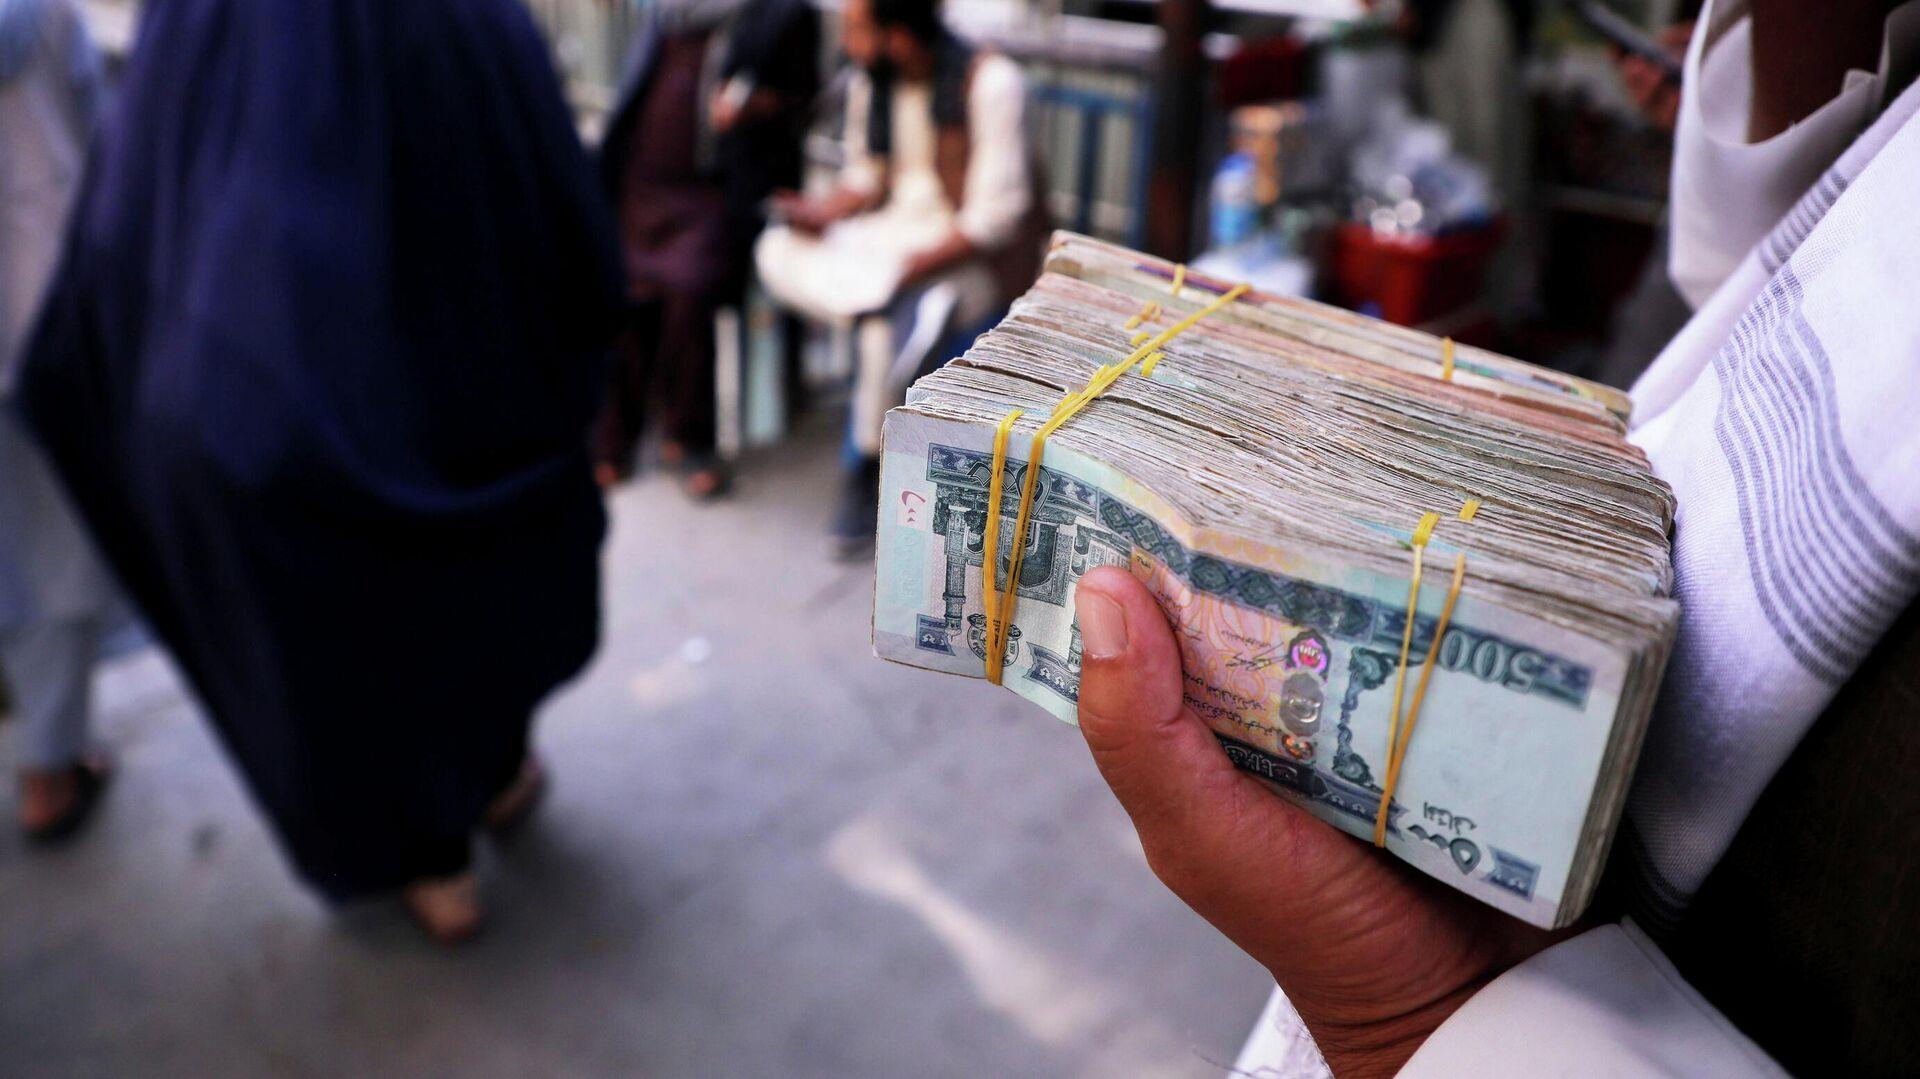 Un hombre con billetes de afganis en Kabul - Sputnik Mundo, 1920, 09.09.2021